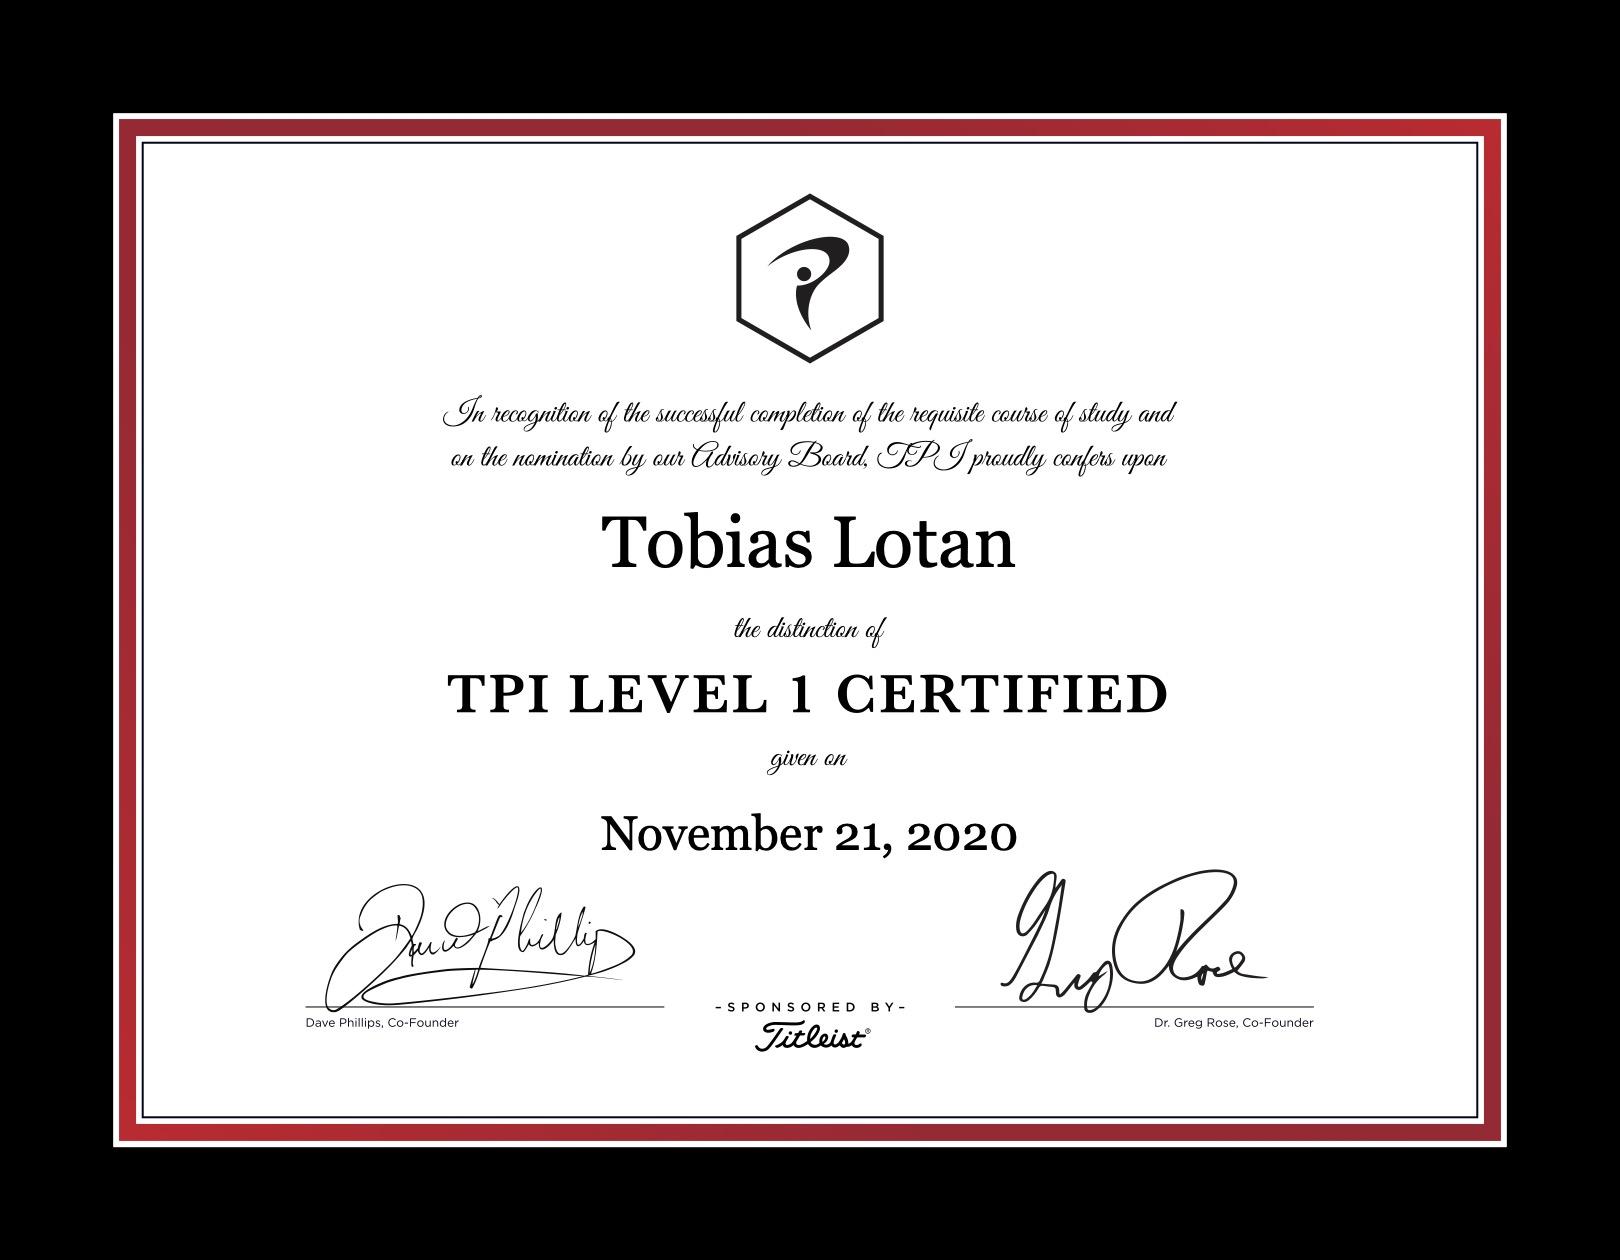 Certificate for titelist performance institute.